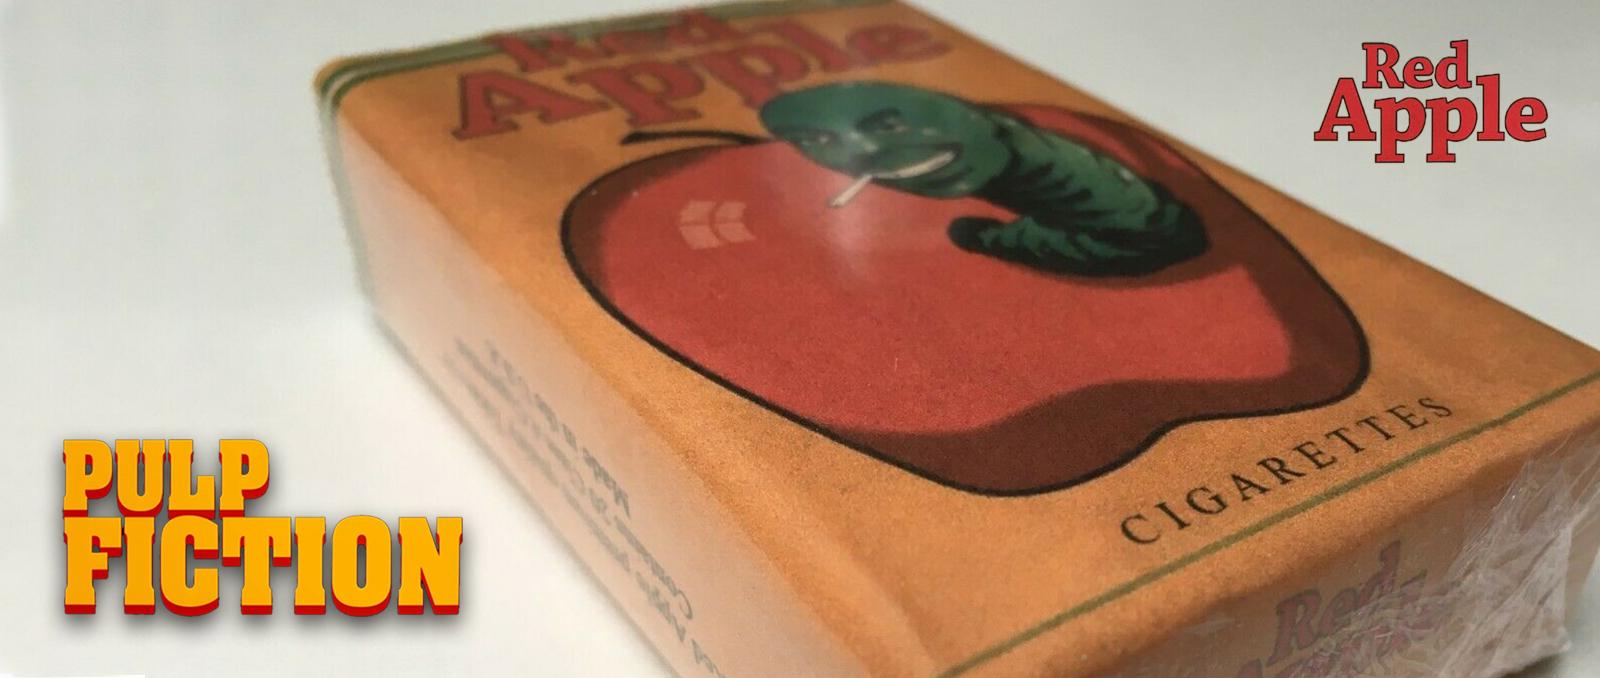 Red Apple Pulp Fiction Tarantino cigarette brand